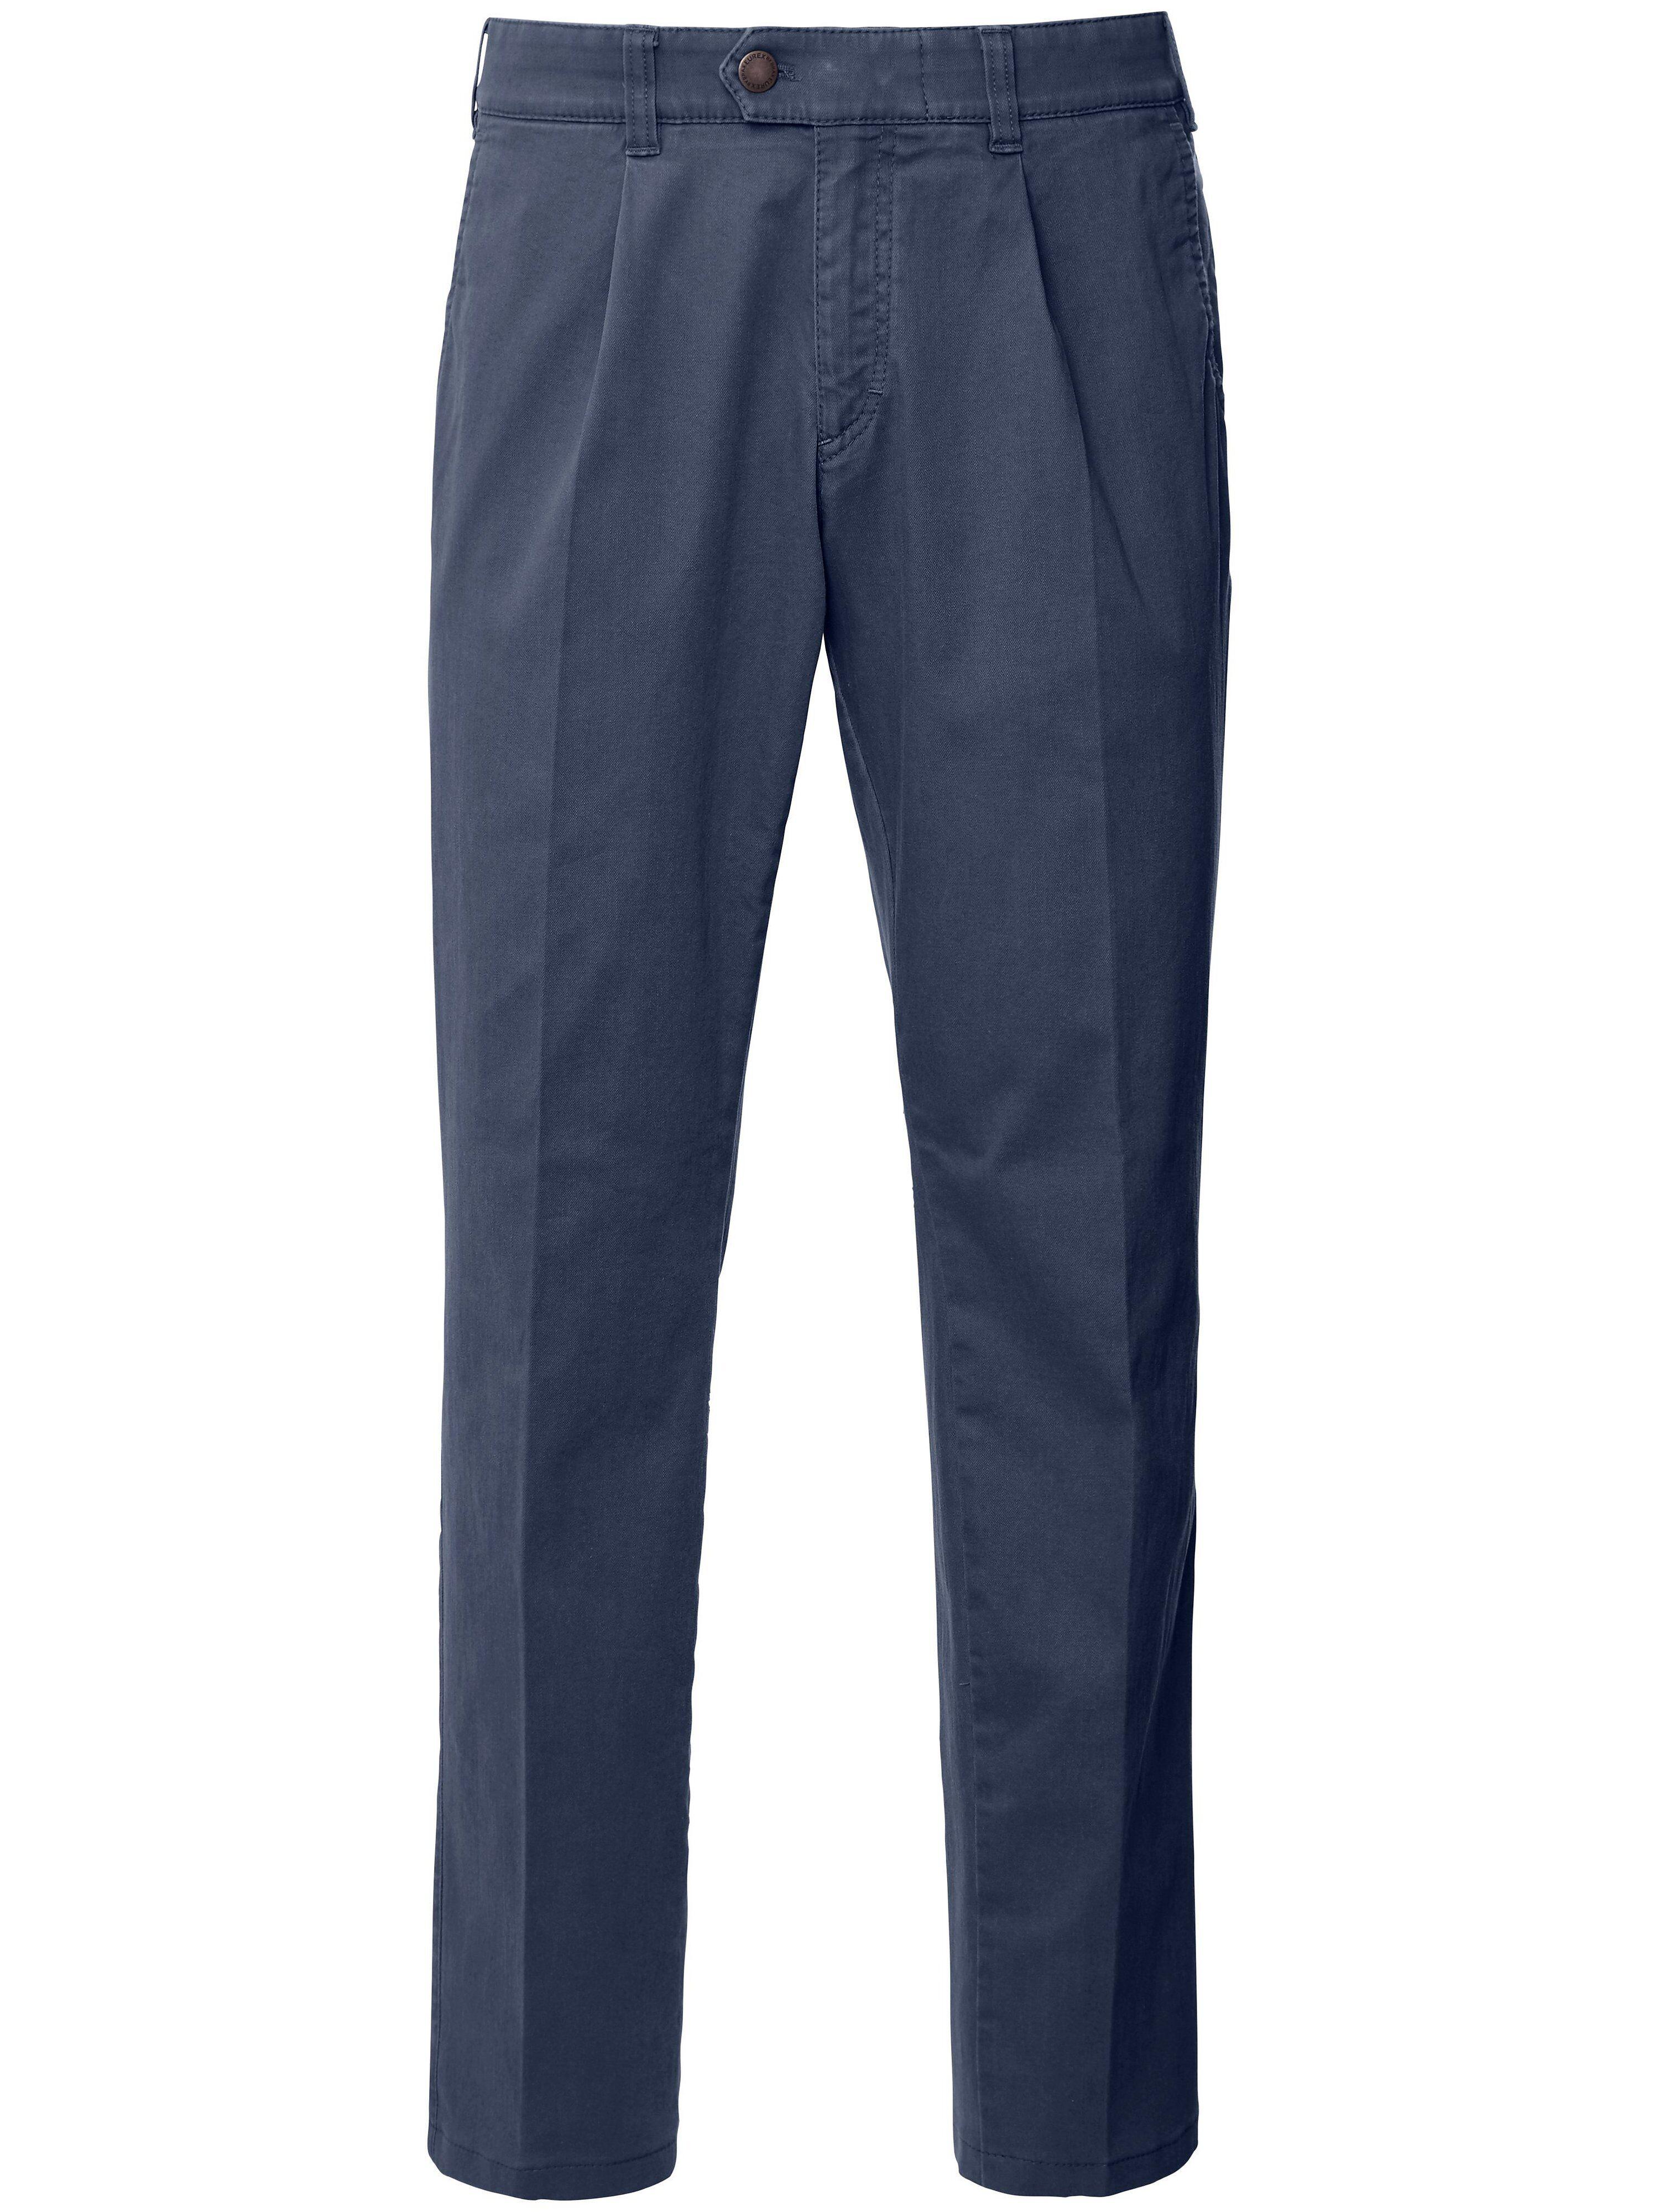 Brax Le pantalon à pinces  Eurex by Brax bleu  - Homme - 28